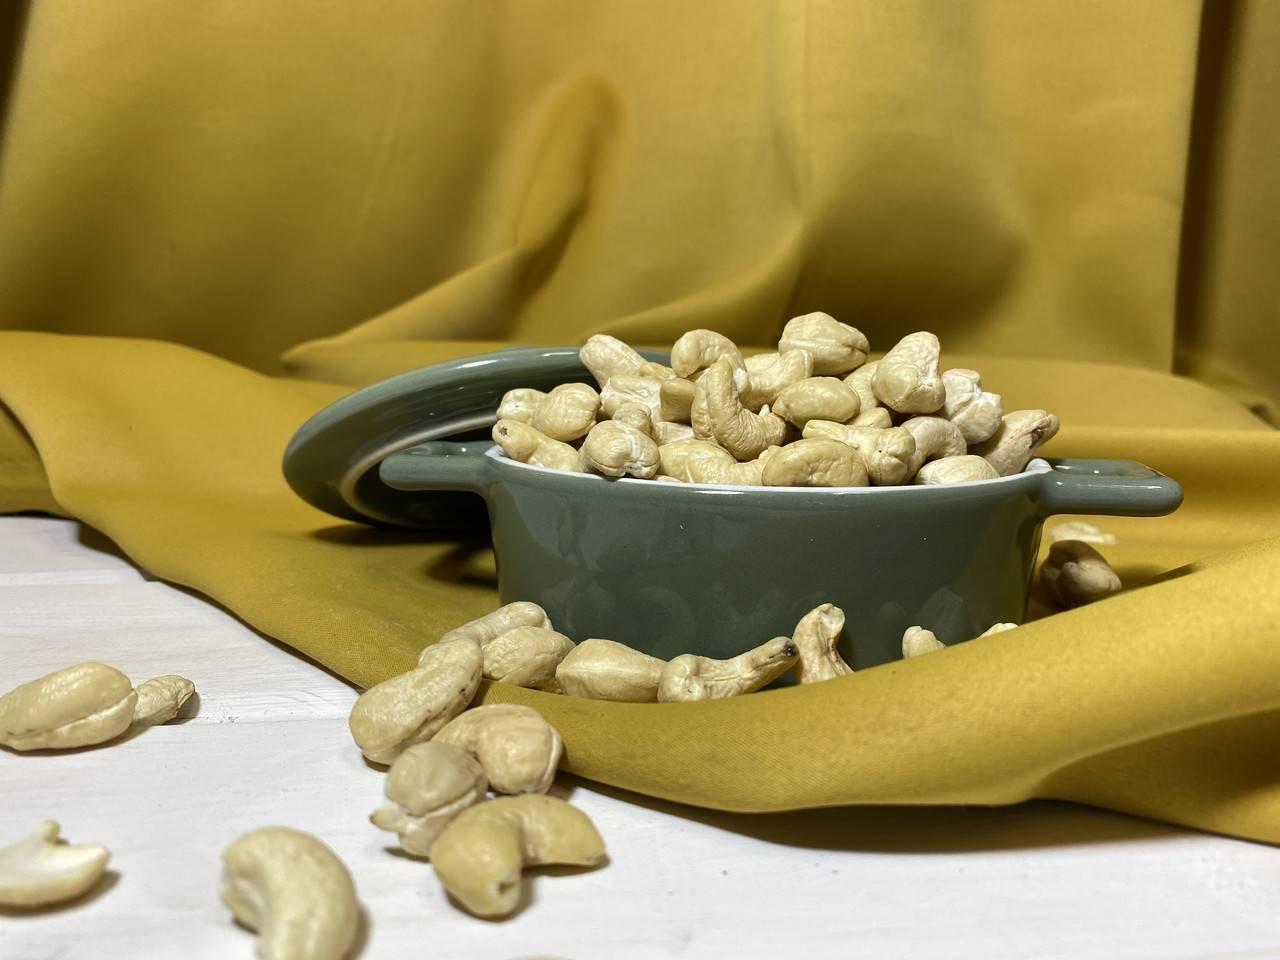 Орехи и арахис при сахарном диабете можно ли есть диабетикам